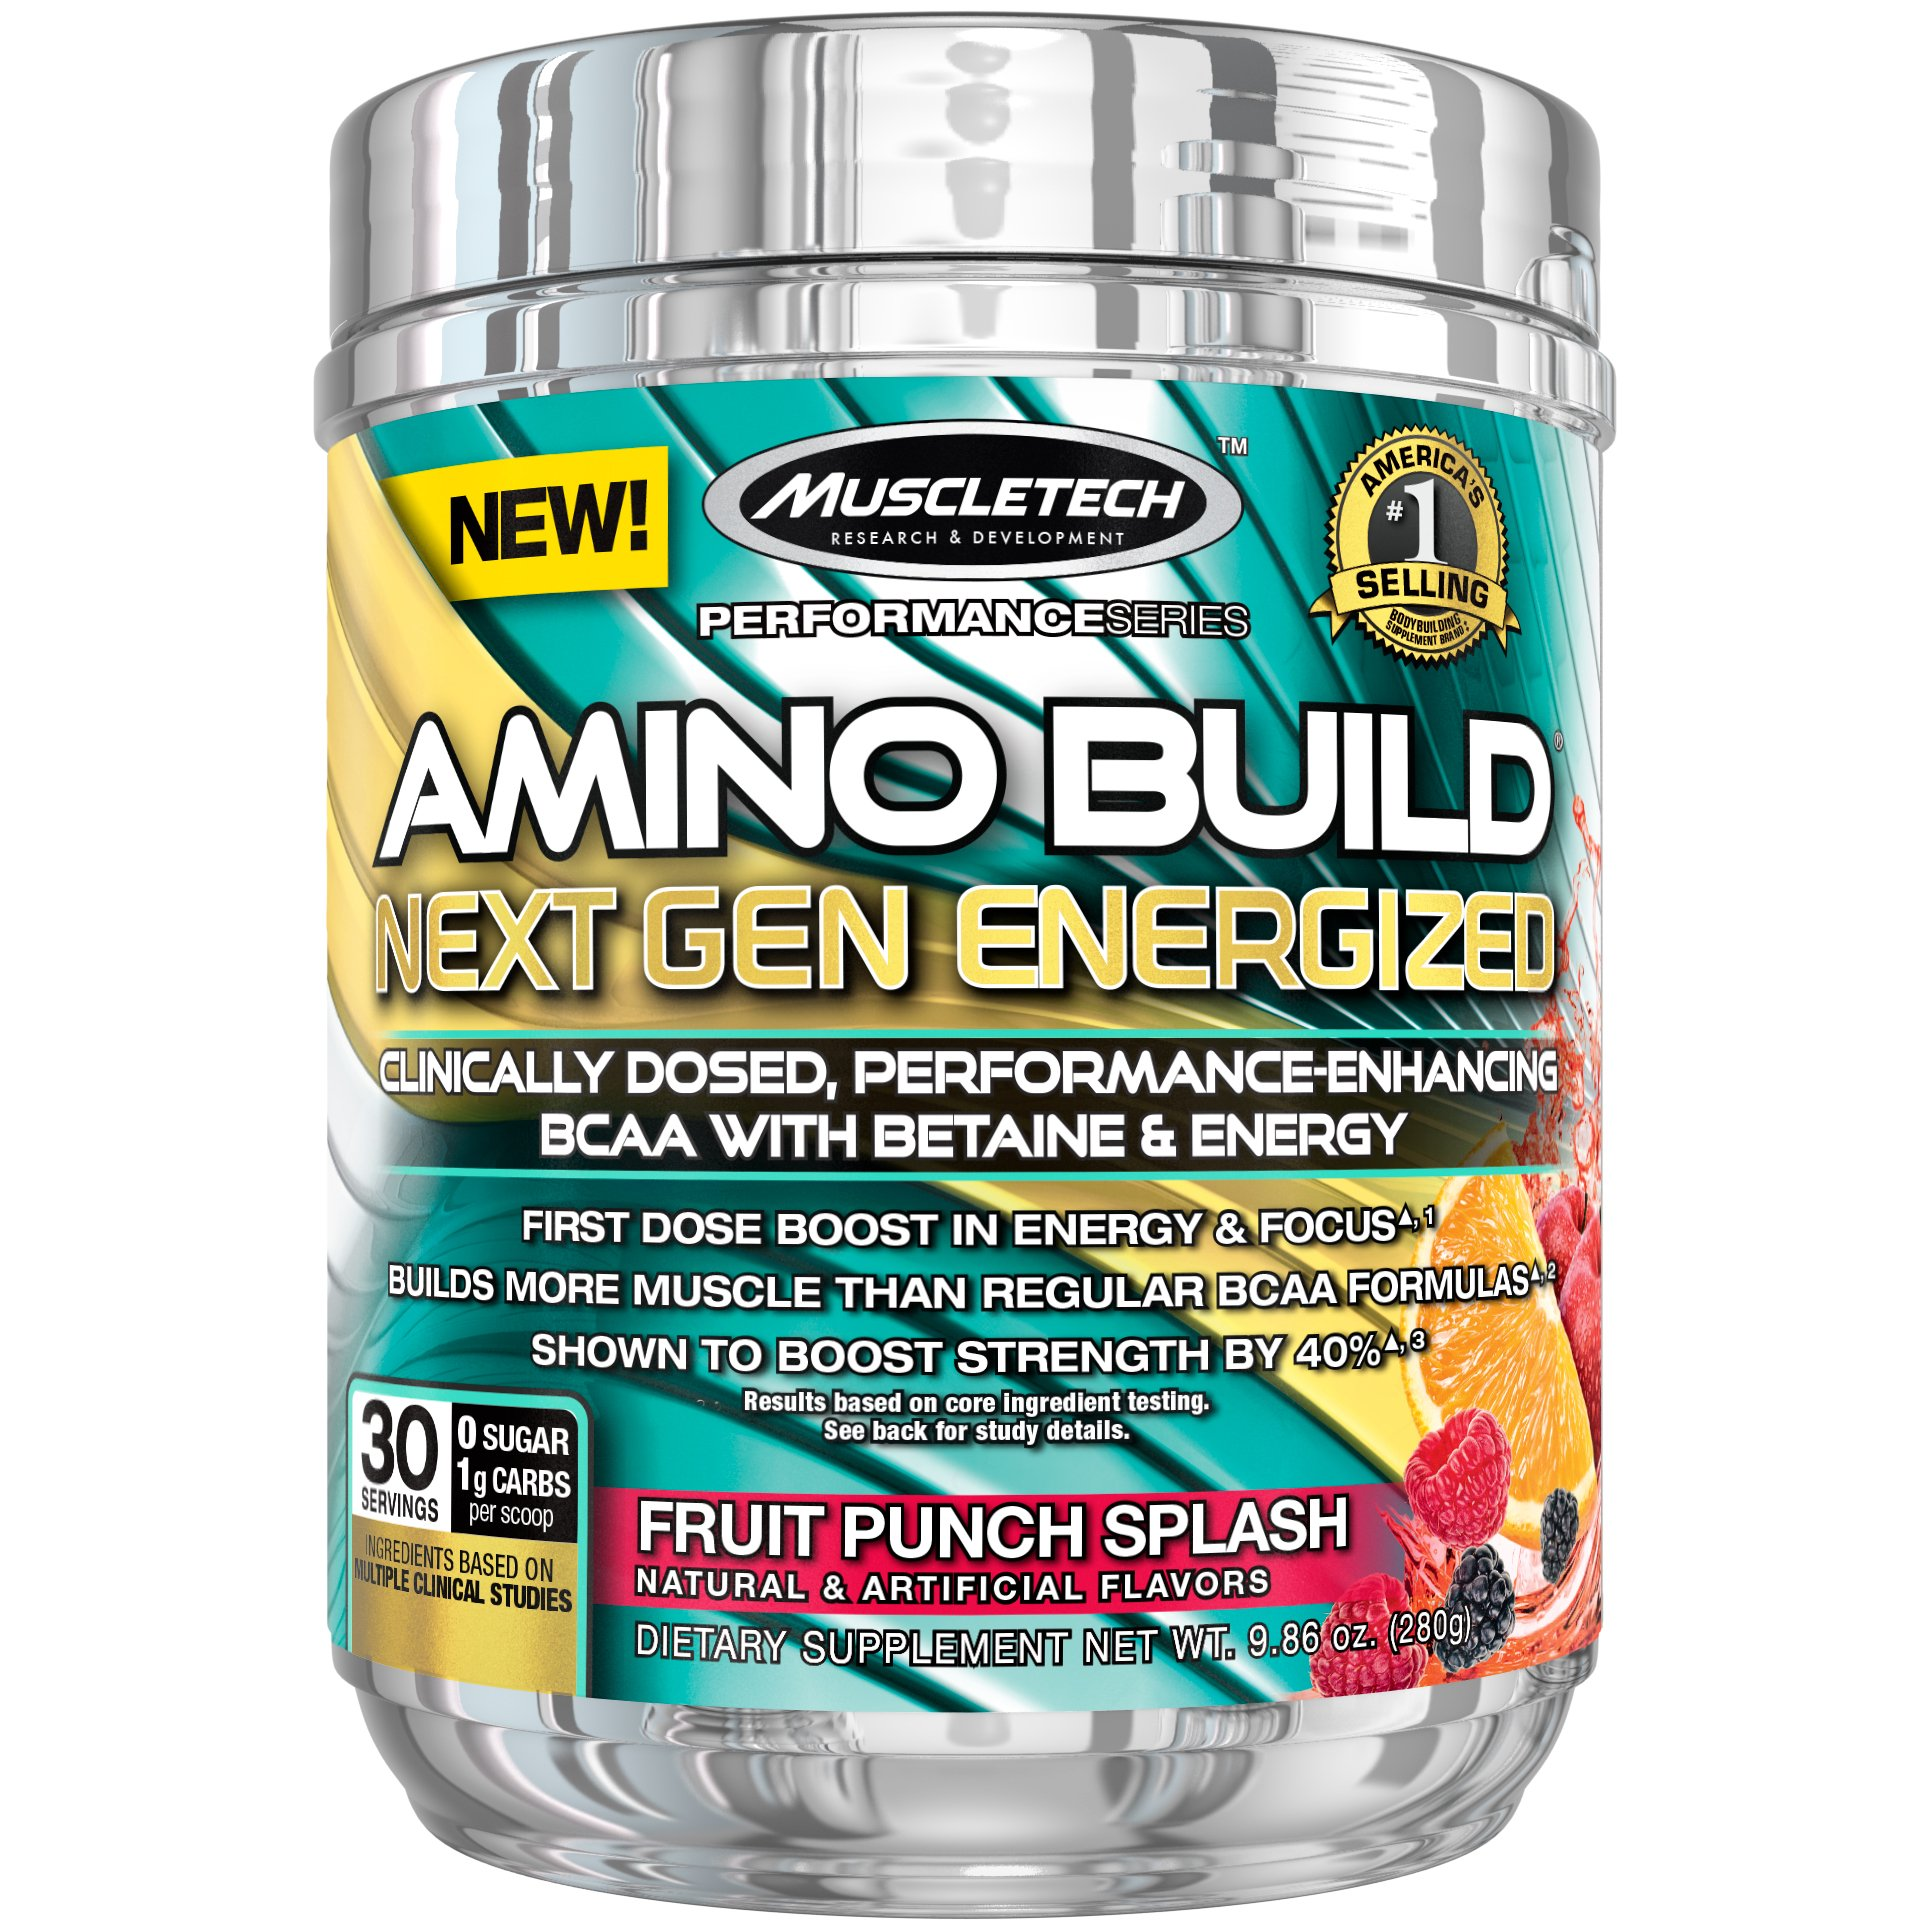 MuscleTech Amino Build Next Gen Energized, Best BCAA Amino Acids Formula with Energy, Fruit Punch, 10.03 oz. (284g)